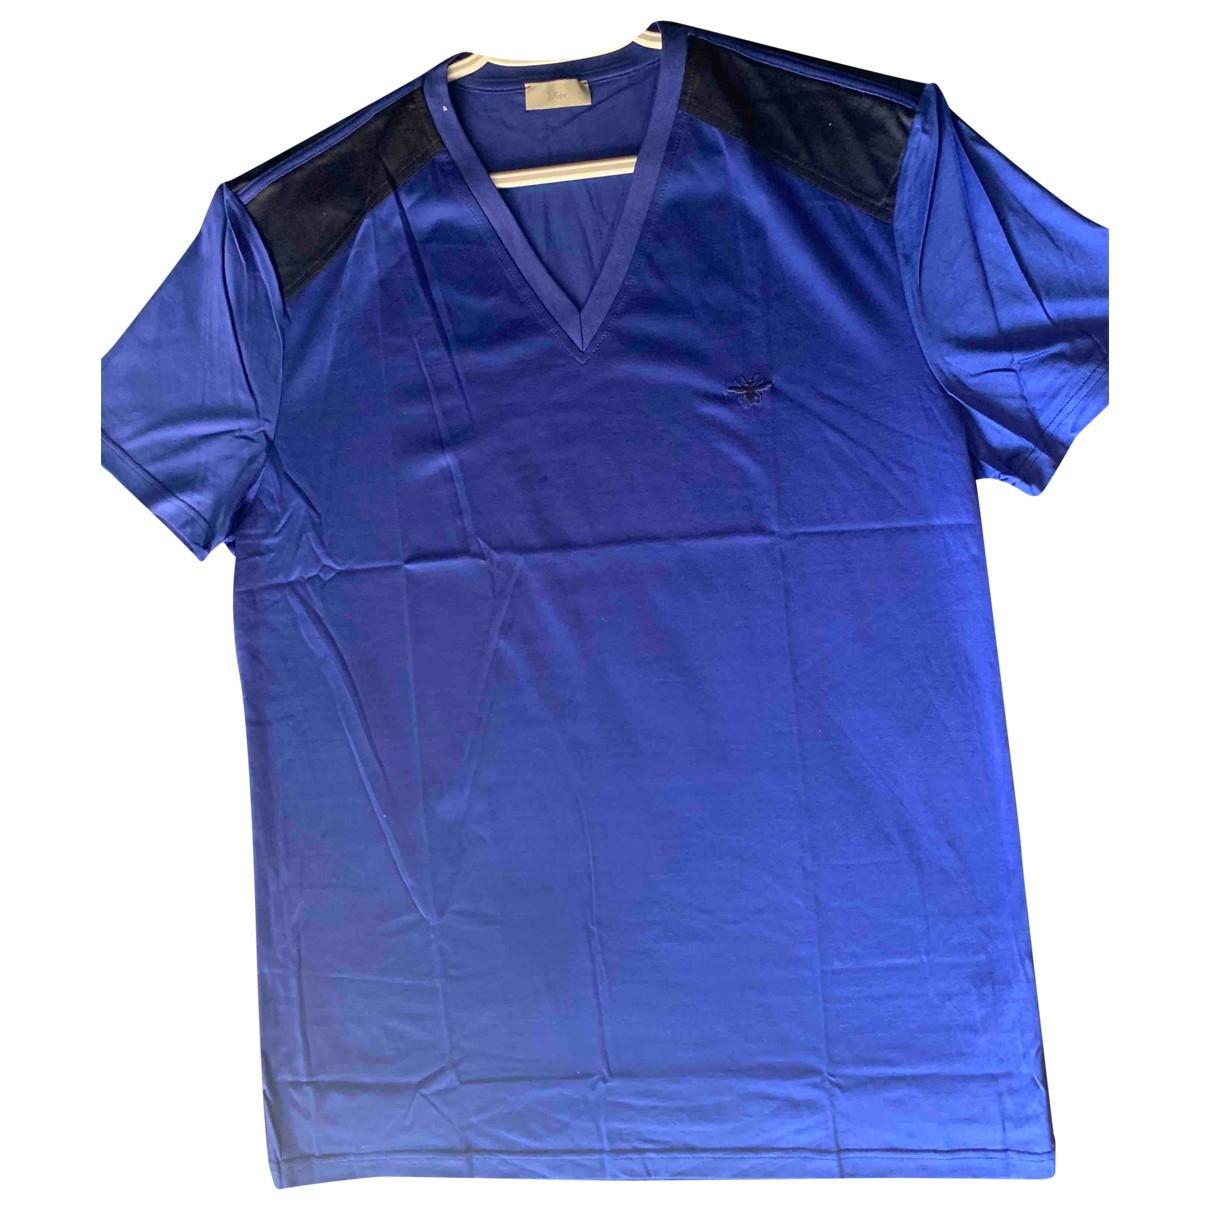 Dior Homme - Tee shirts   pour homme en coton - bleu